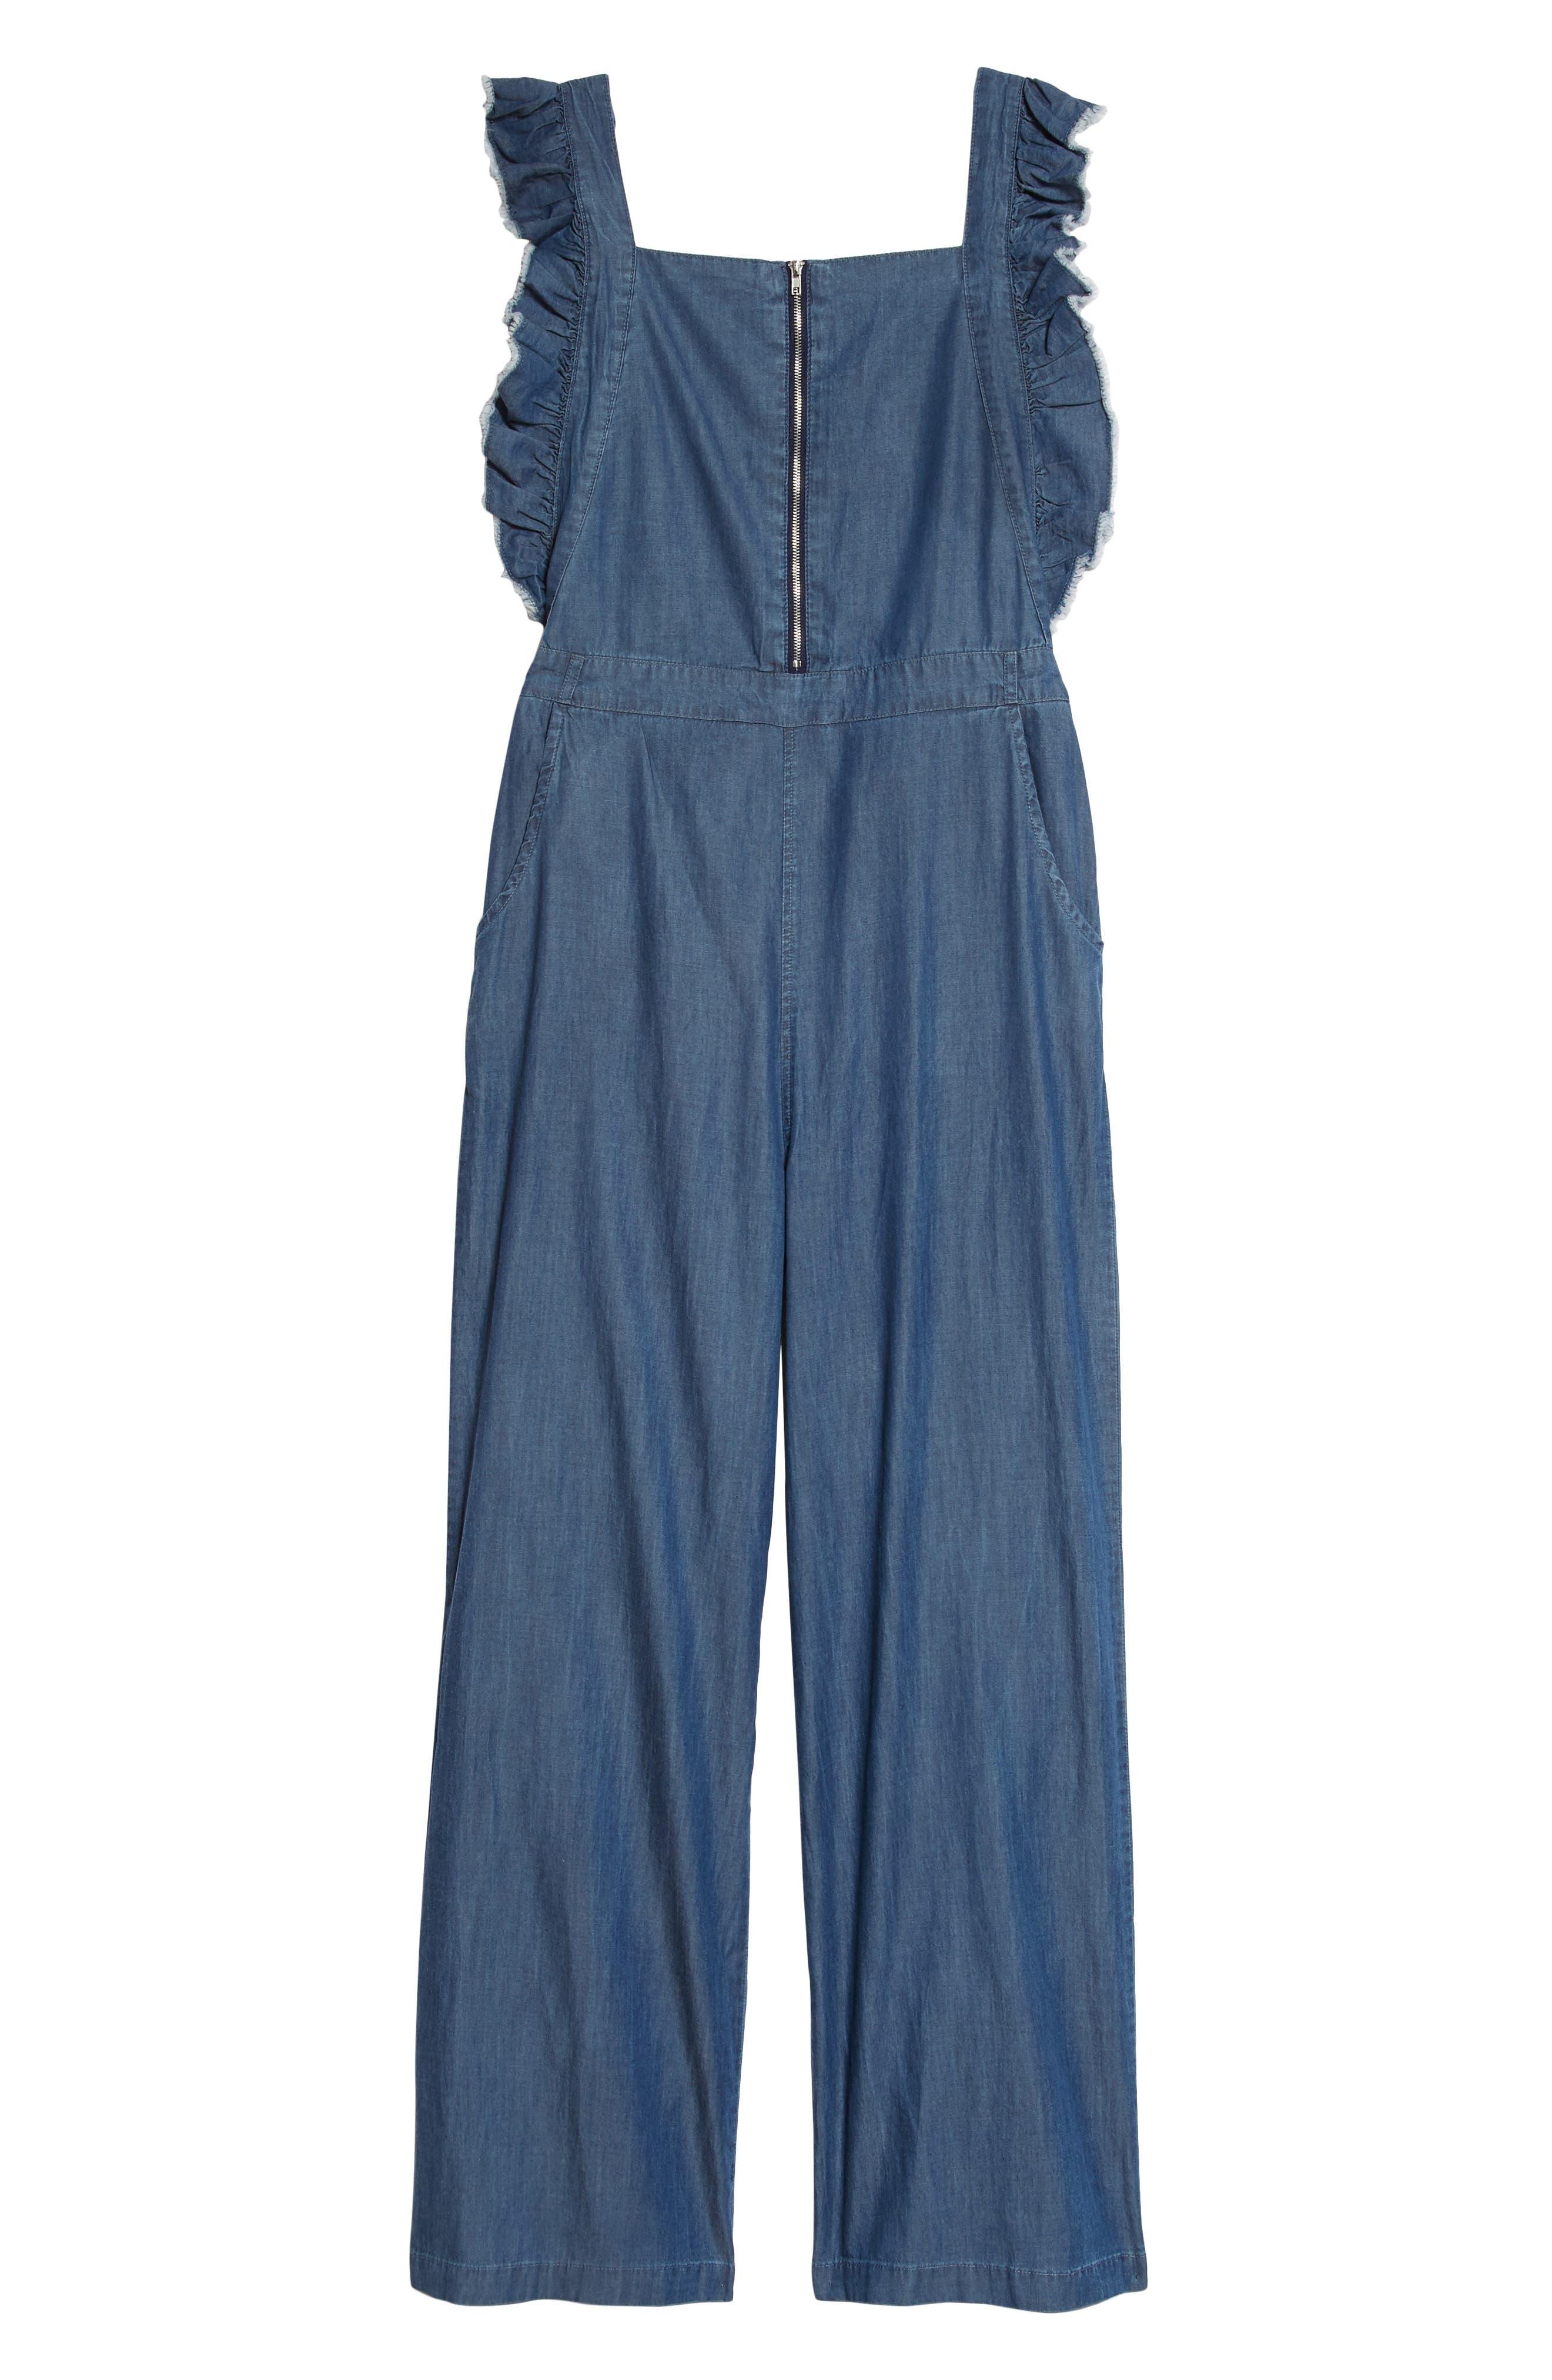 Ruffle Sleeve Denim Jumpsuit,                         Main,                         color, Denim